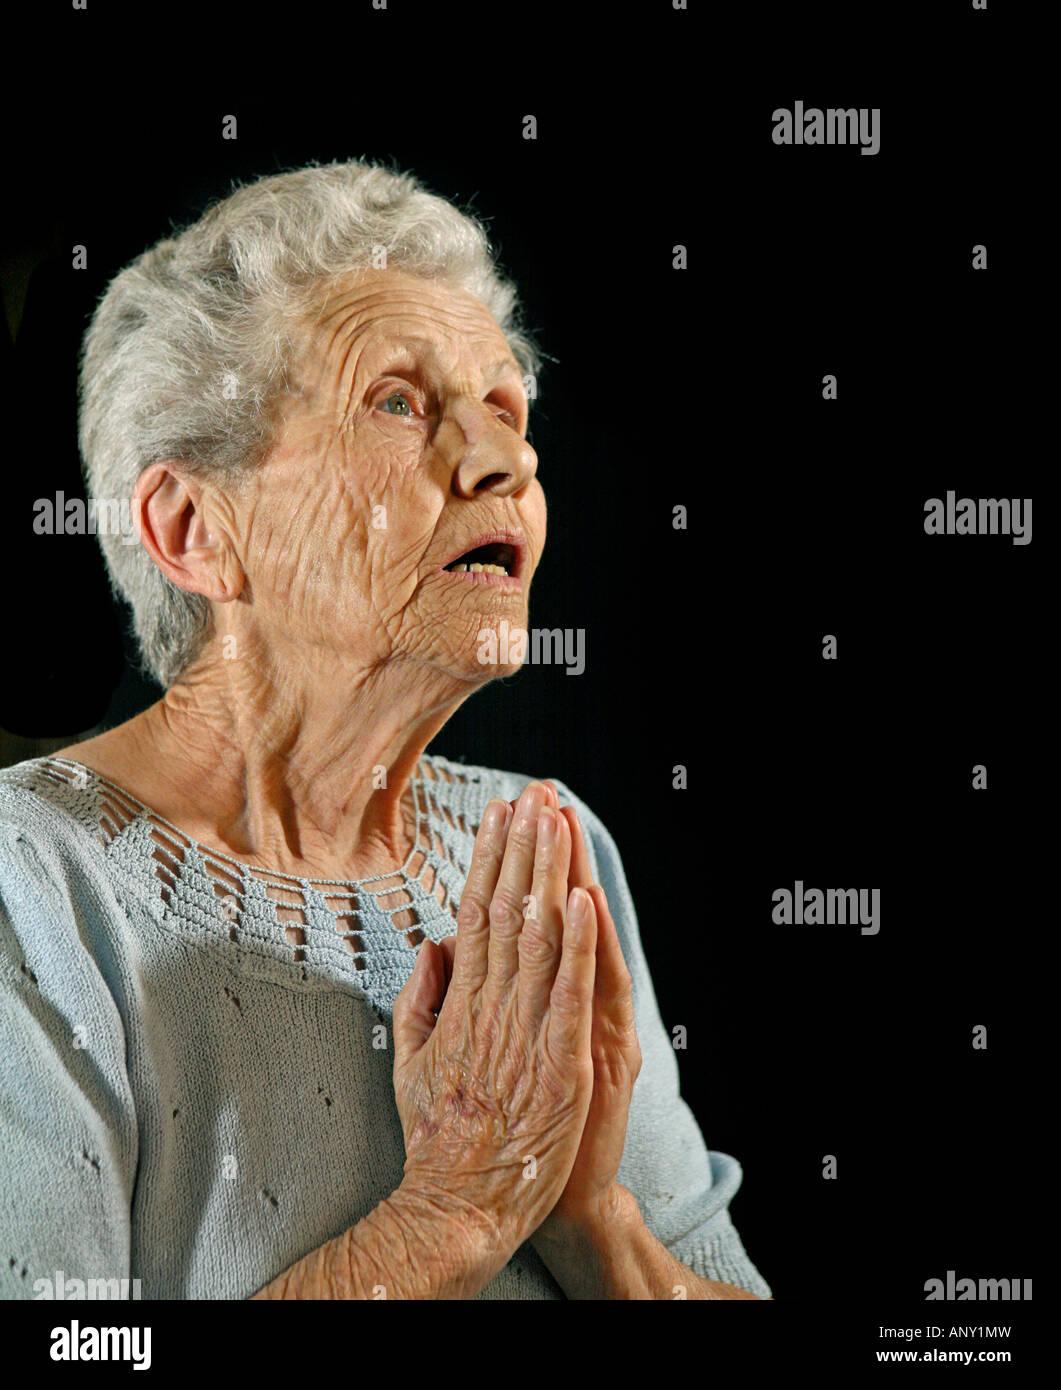 Senior Citizen Praying to the Lord - Stock Image